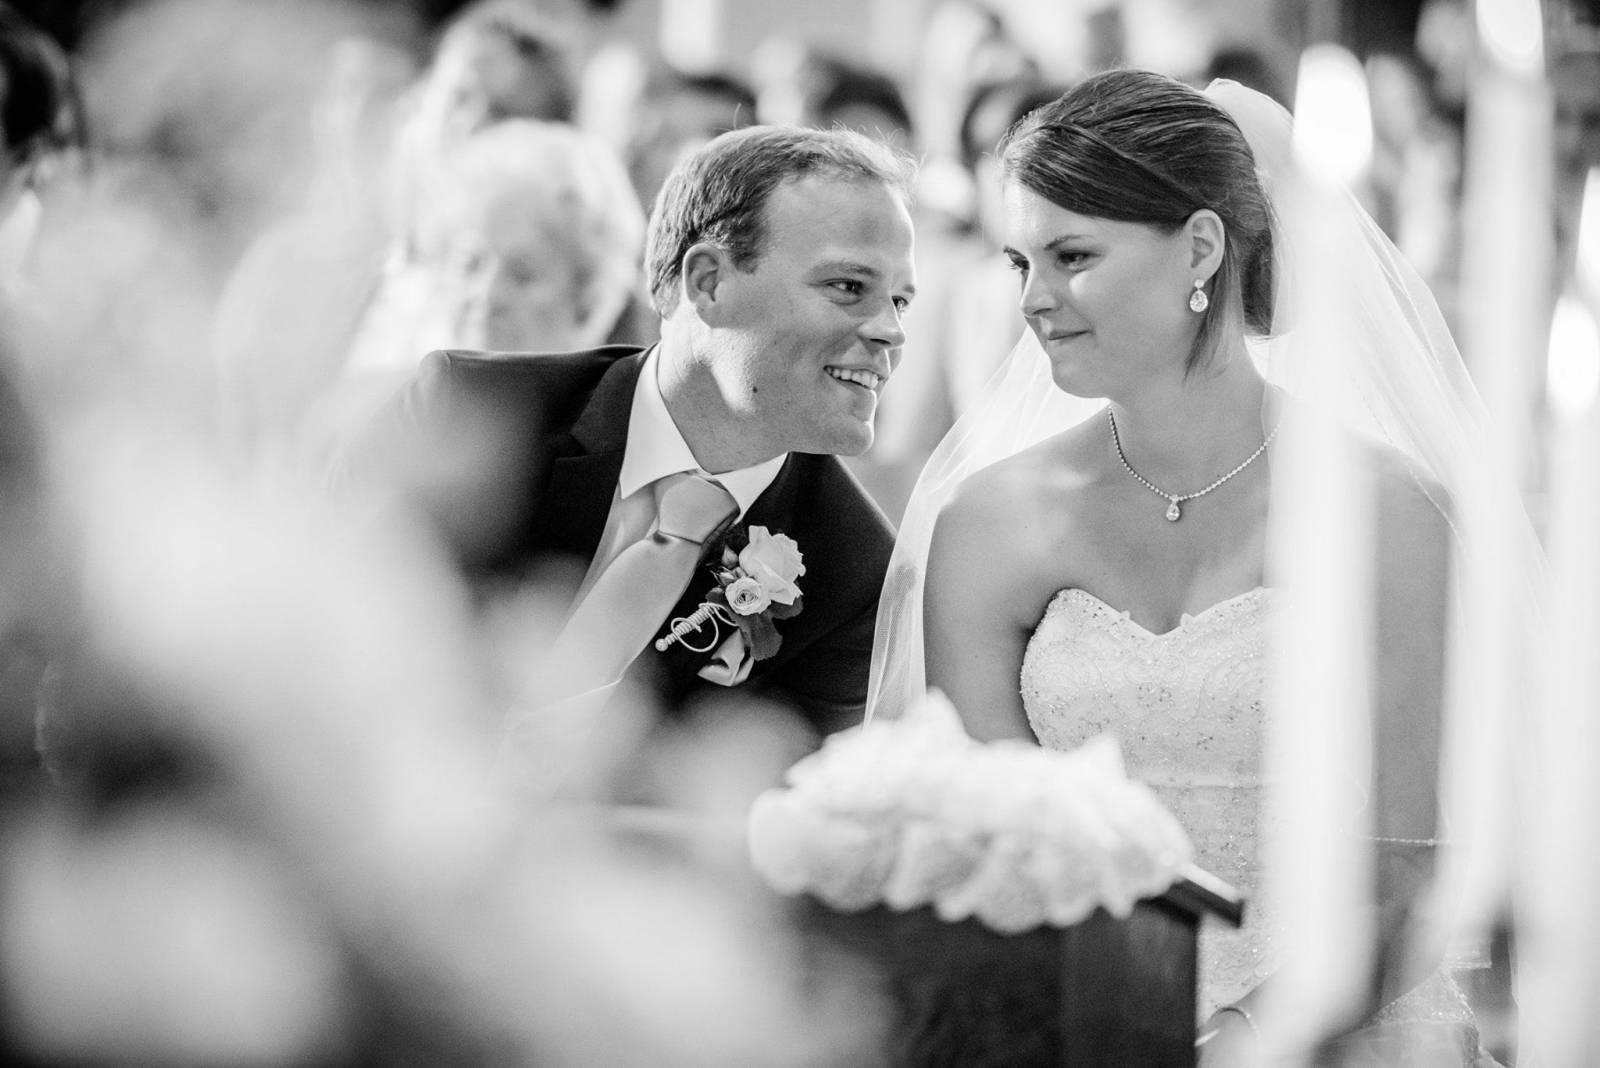 Lauren Bracke - Bruidsmake-up - House of Weddings - 11